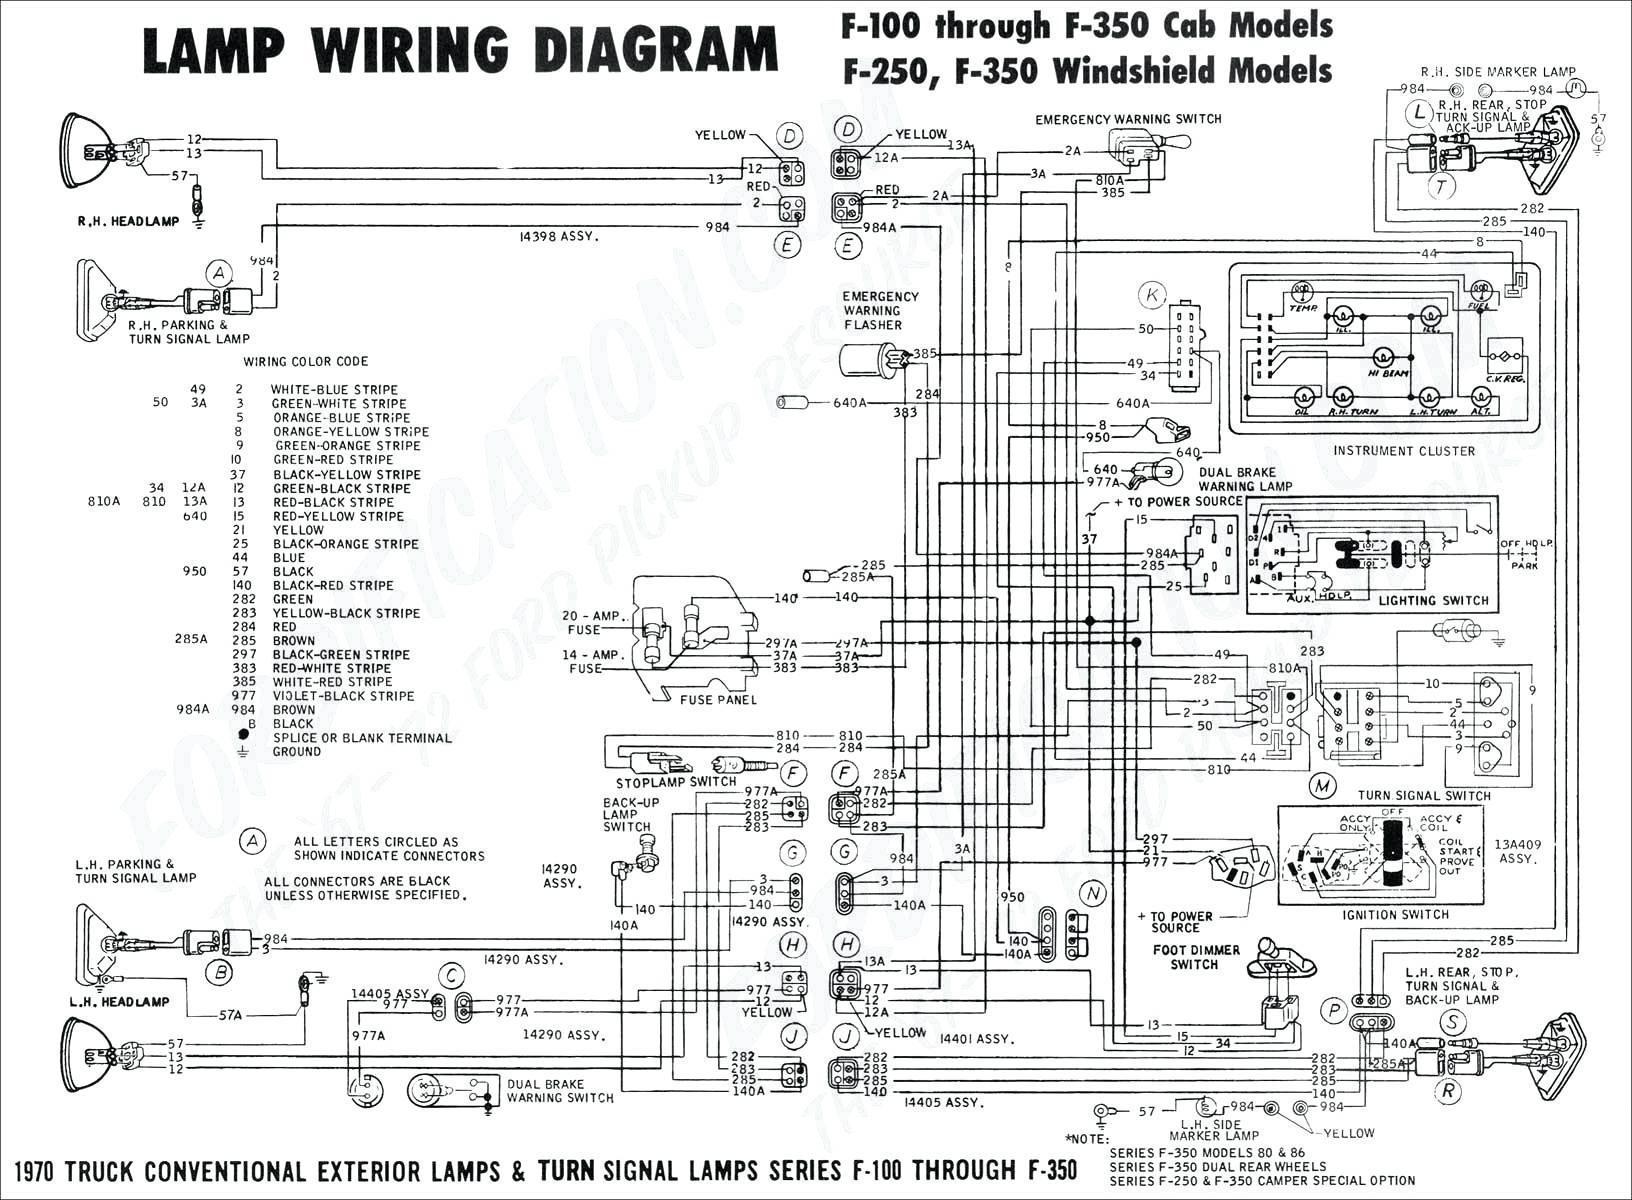 1996 Jeep Grand Cherokee Engine Diagram 3ef30b5 159 69 3 193 1991 Nissan Wiring Diagram Expert Of 1996 Jeep Grand Cherokee Engine Diagram